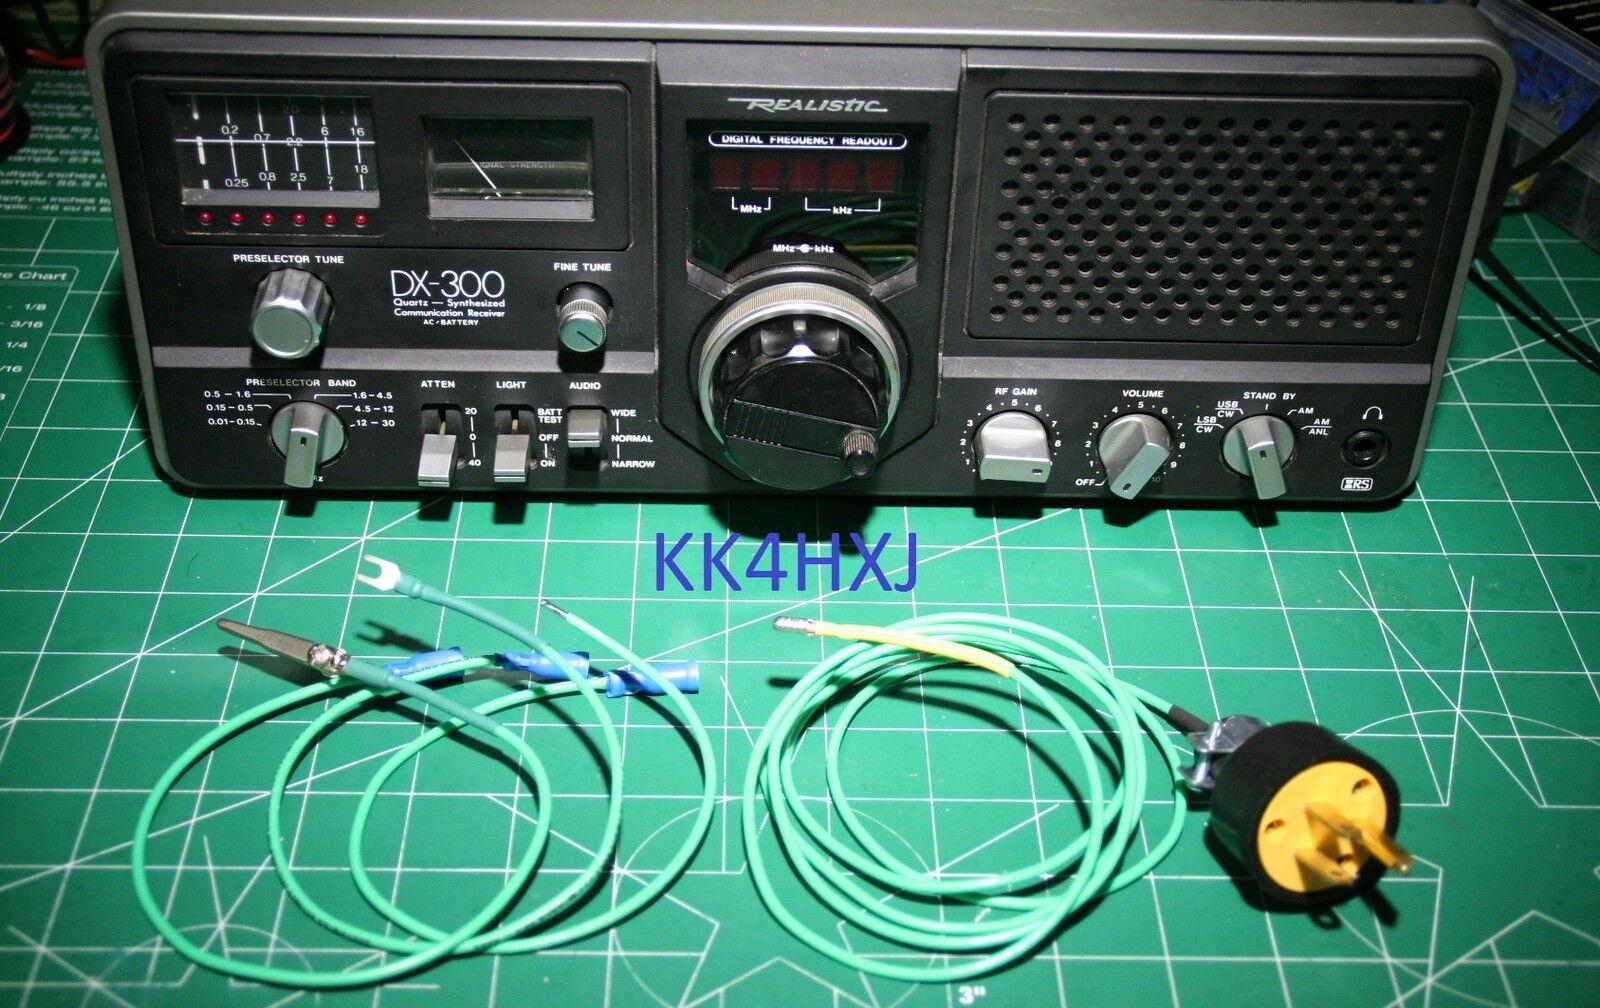 KK4HXJ - Radio & Electronics